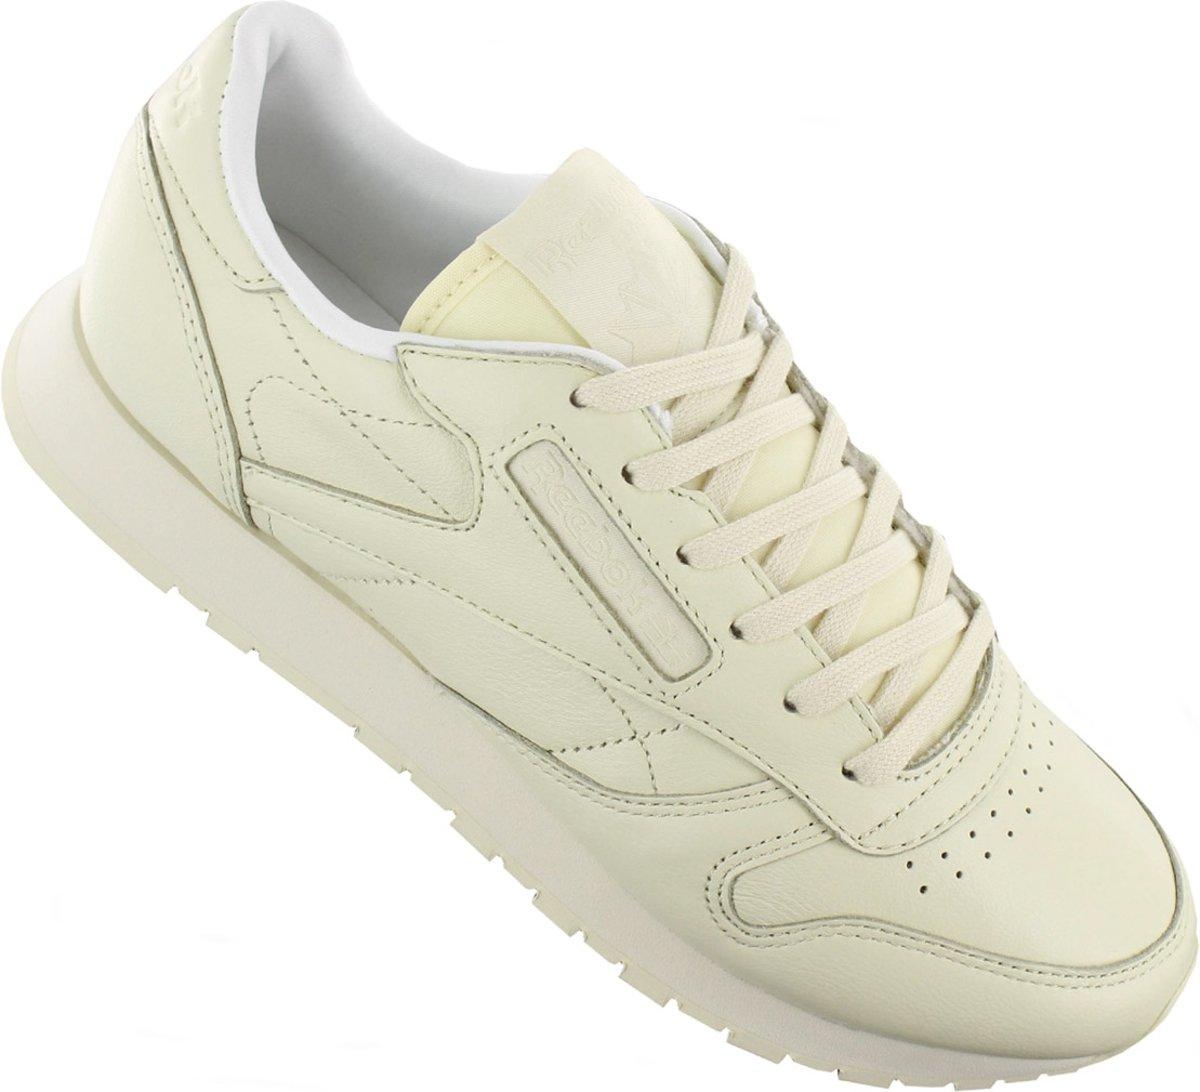 Reebok Cl Lthr Pastels Bd2772 - Sneakers Chaussures - Femmes - Jaune - Taille 41 iYqMkinnDf